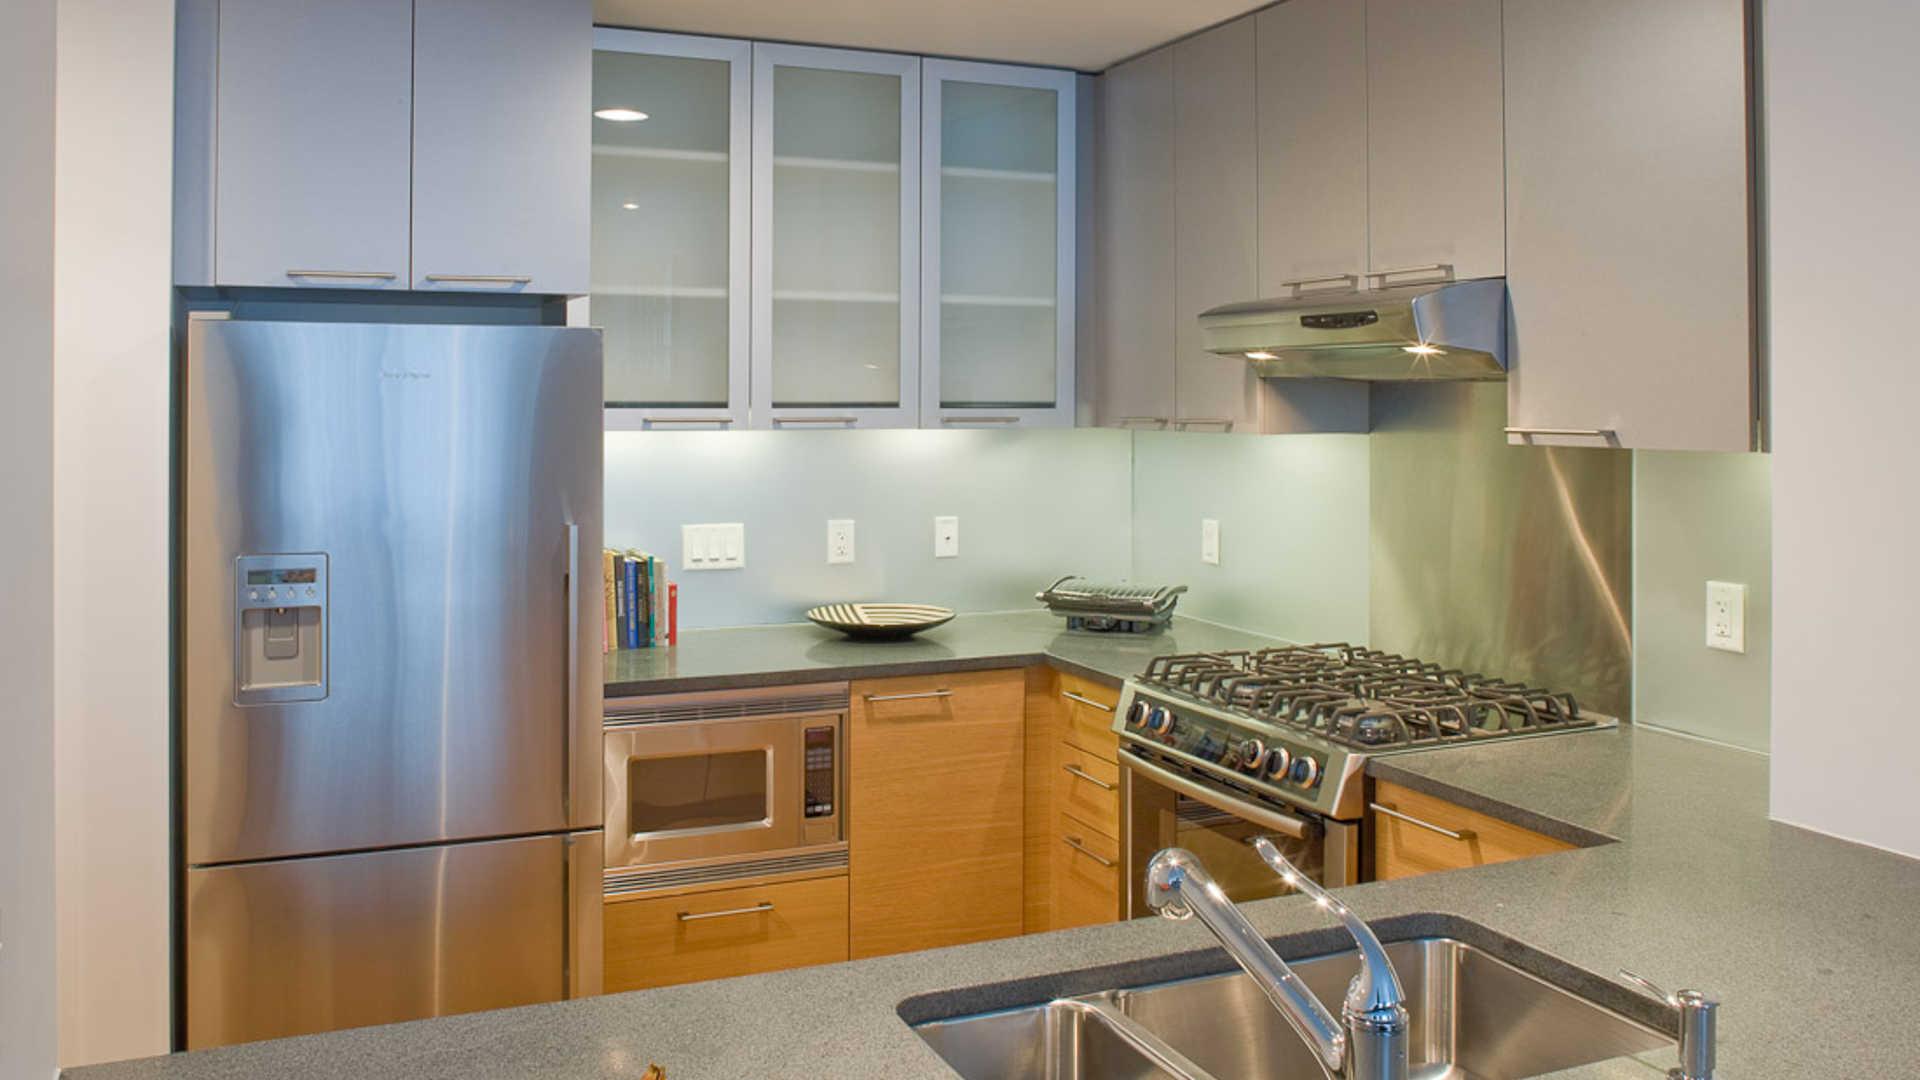 Third square apartments kitchen